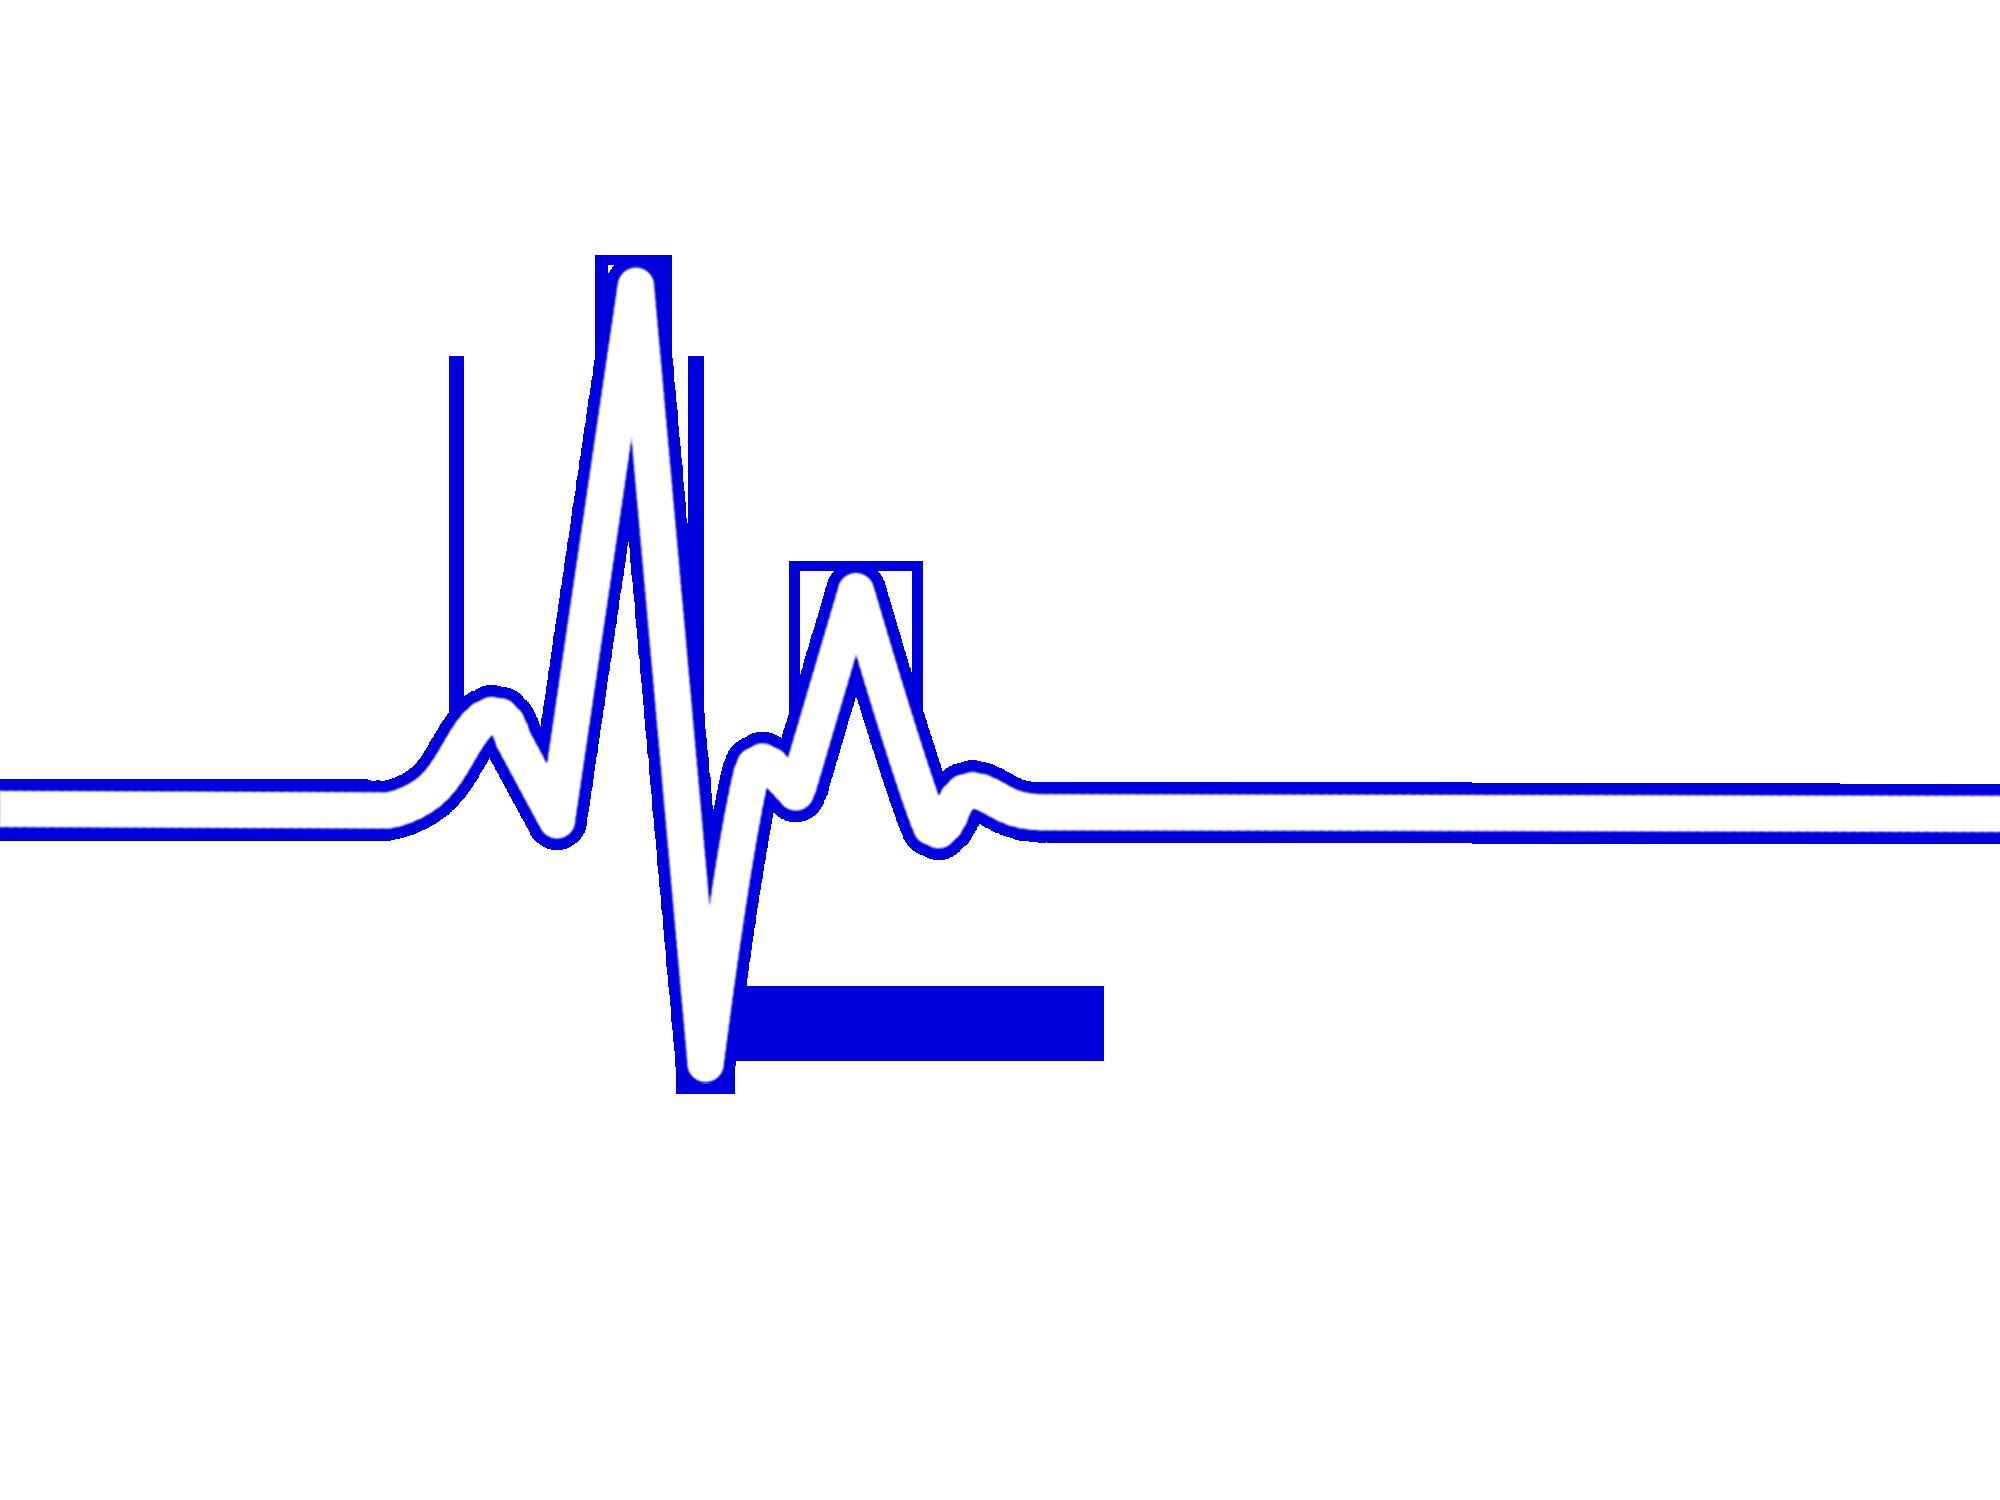 Rate bpm ecg ekg. Heartbeat clipart heart monitor line